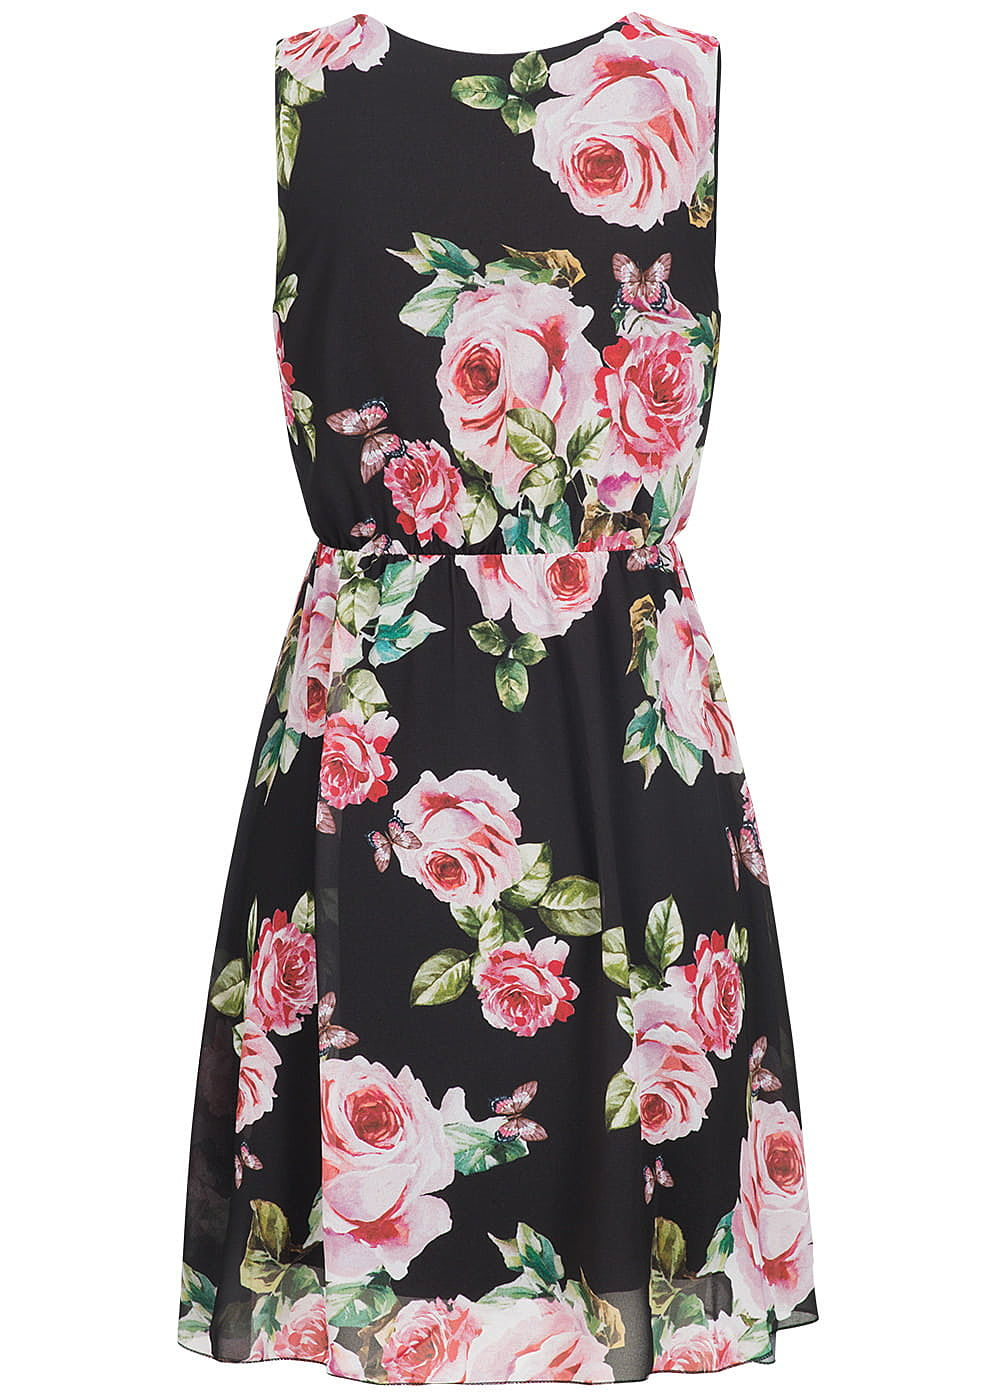 styleboom fashion damen kleid rosen print zipper vorne schwarz rosa gr n 77onlineshop. Black Bedroom Furniture Sets. Home Design Ideas